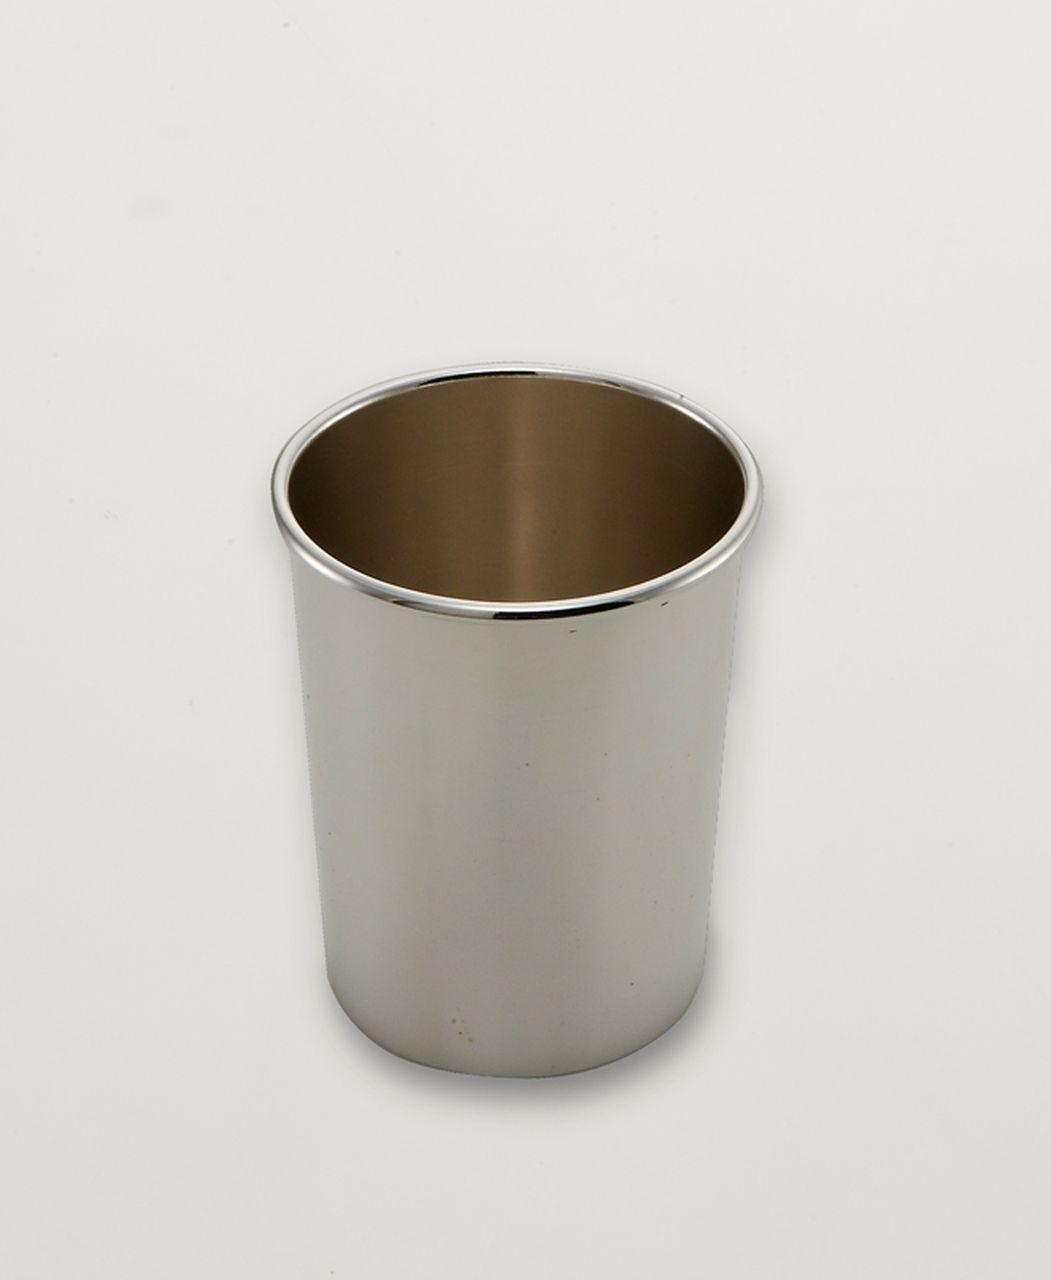 Bicchierino classic argentato argento sheffield cm.8,5h diam.7,5